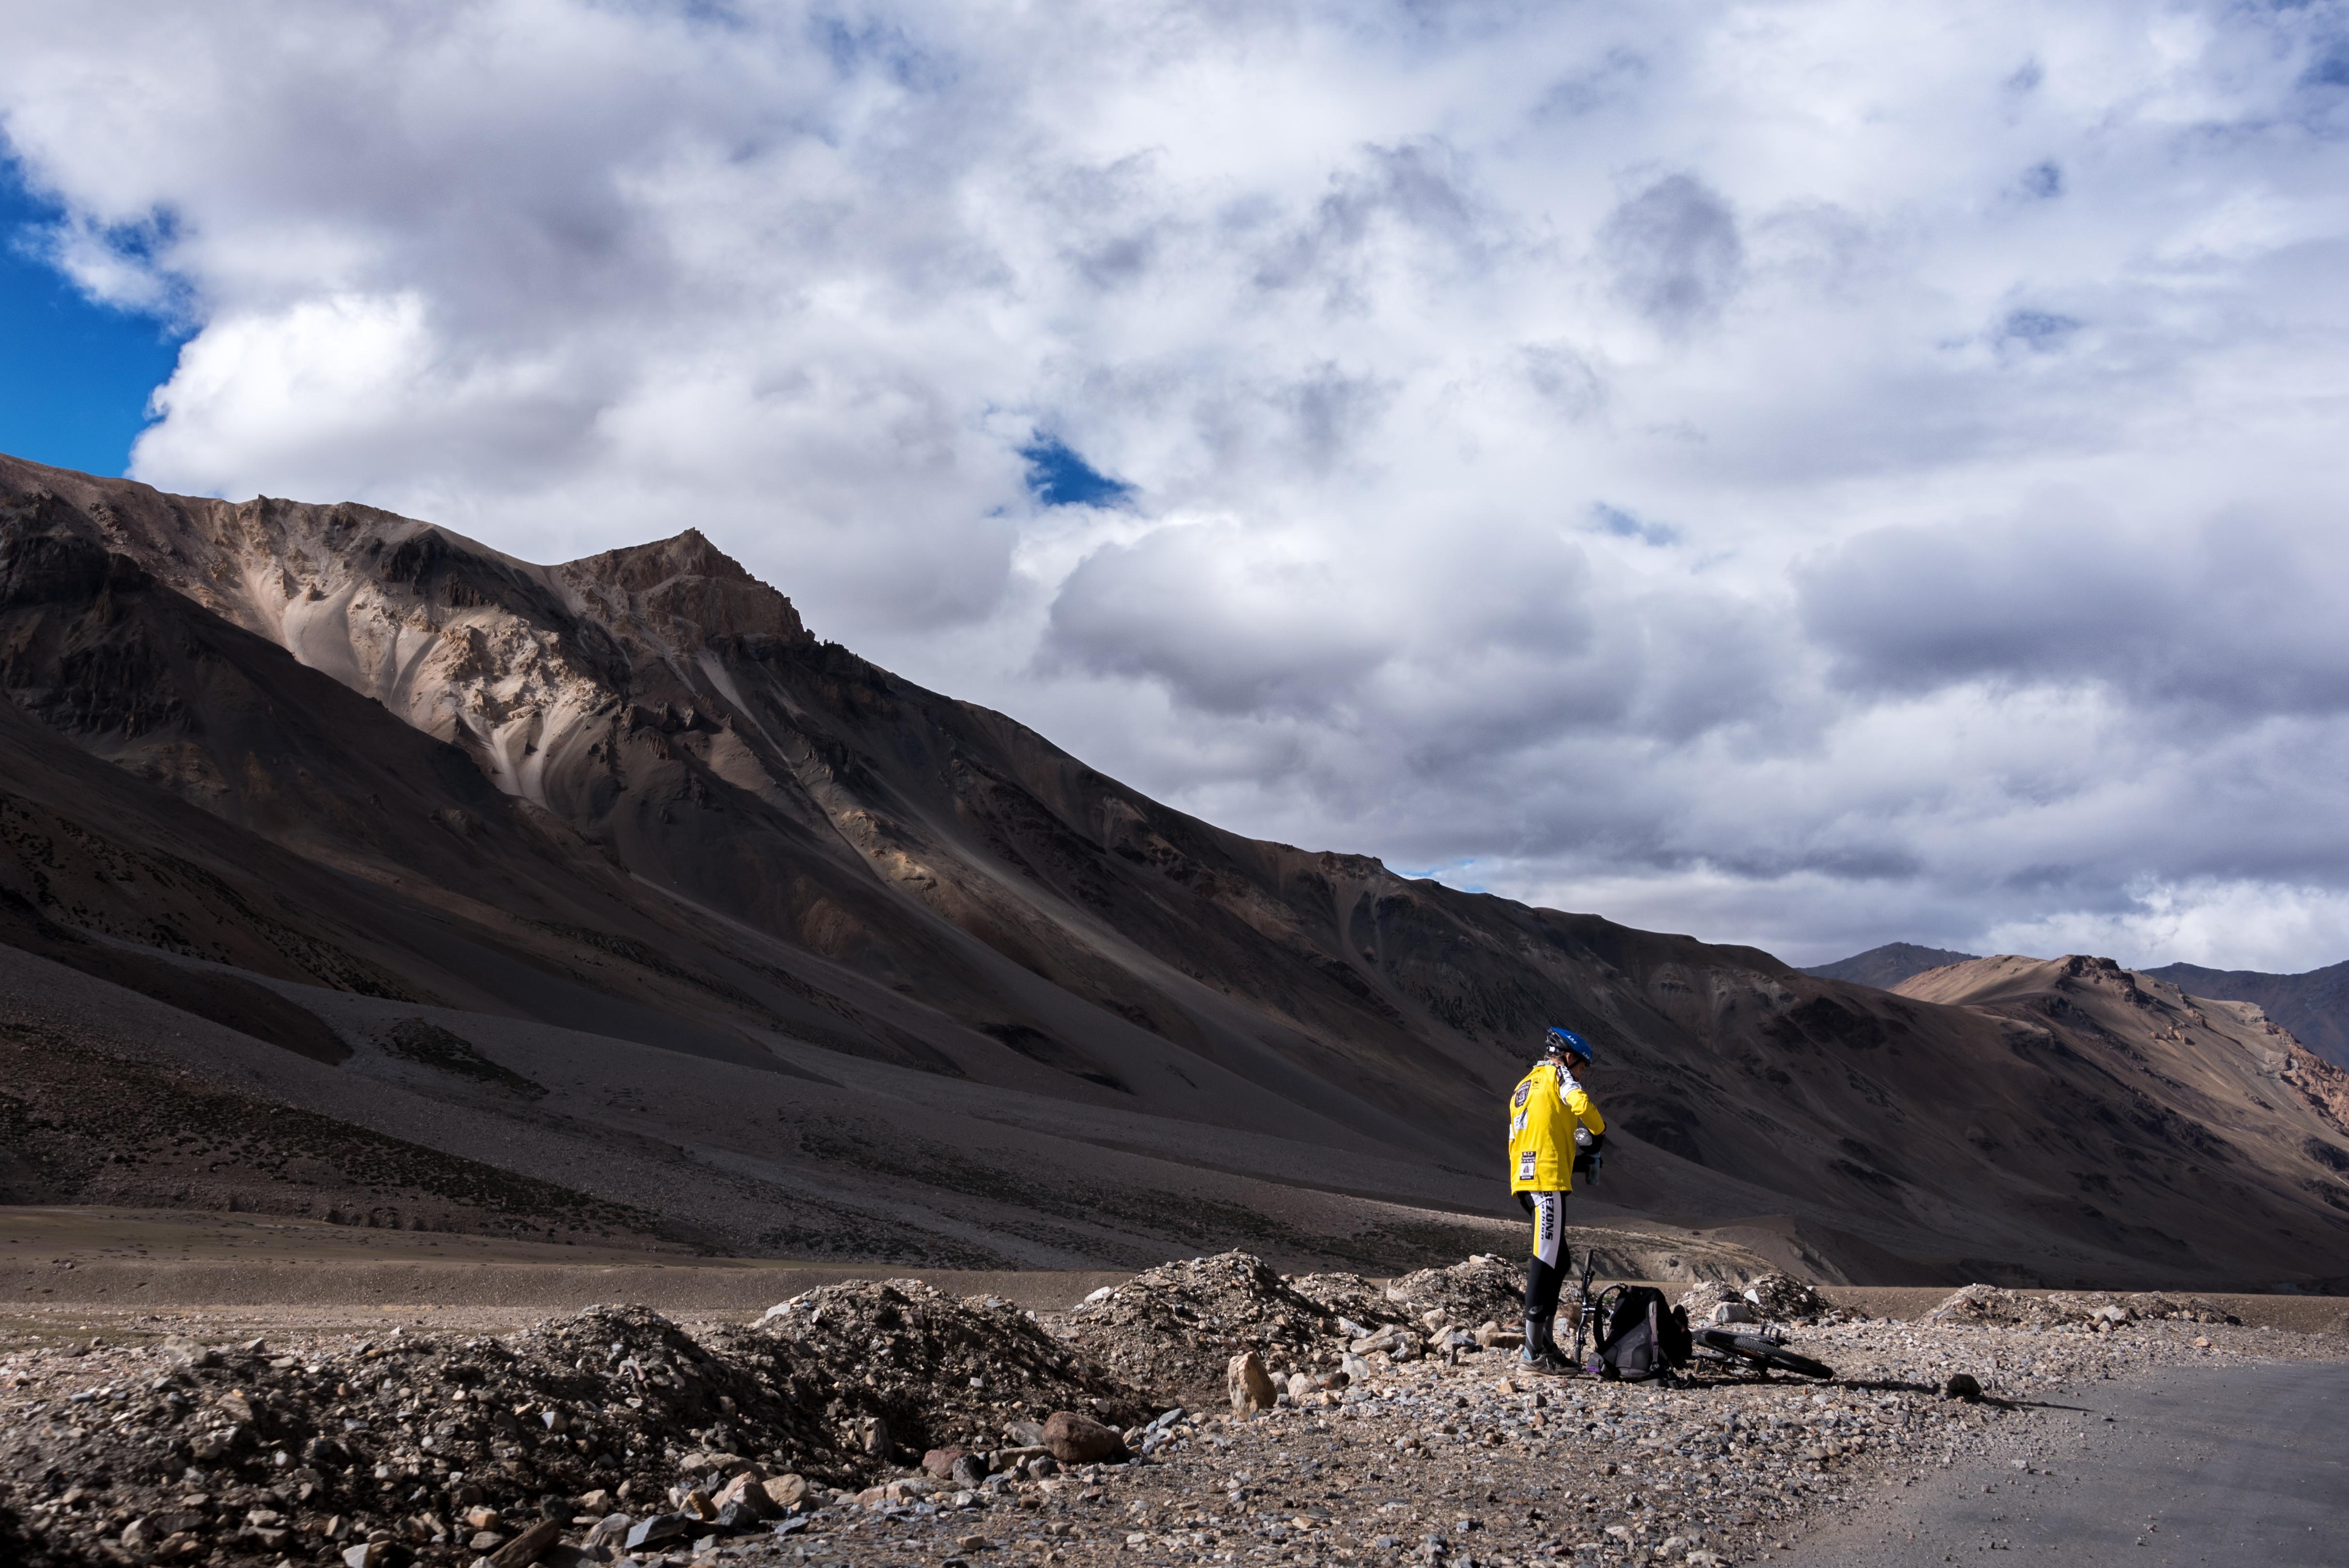 Mountain Biker Takes A Refreshing Break